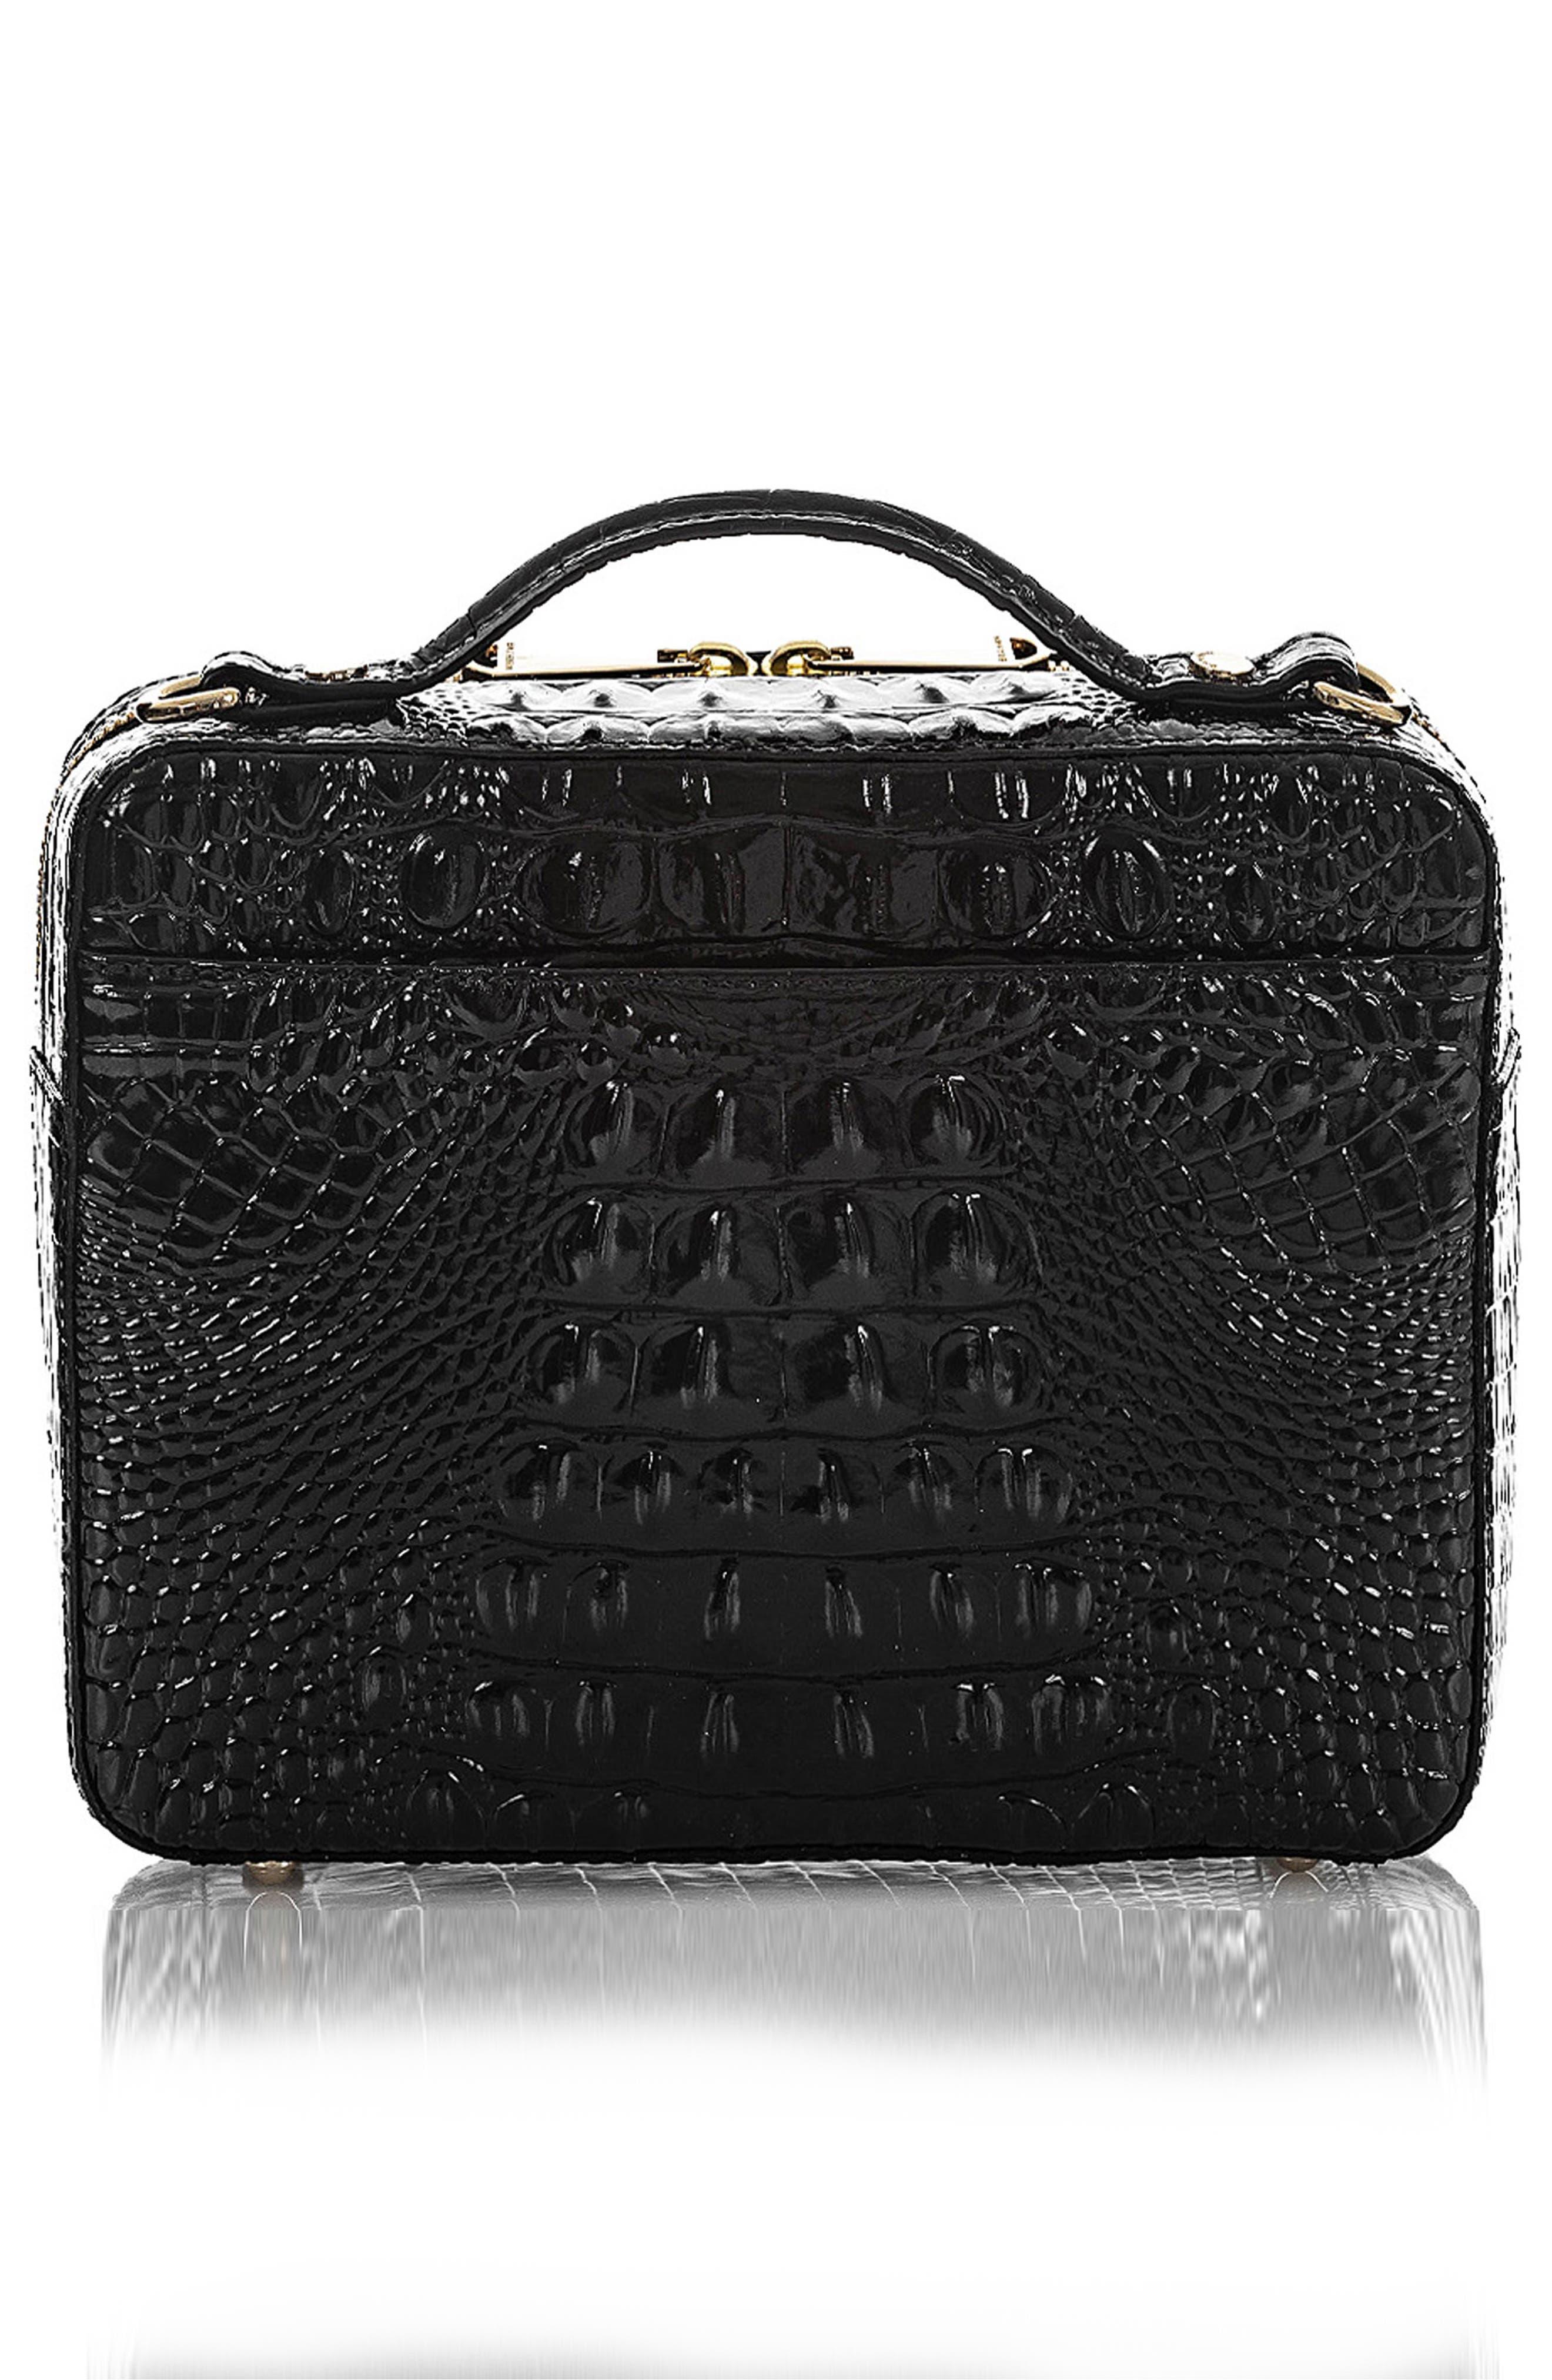 Evie Croc Embossed Leather Top Handle Bag,                             Alternate thumbnail 2, color,                             BLACK MEMBOURNE